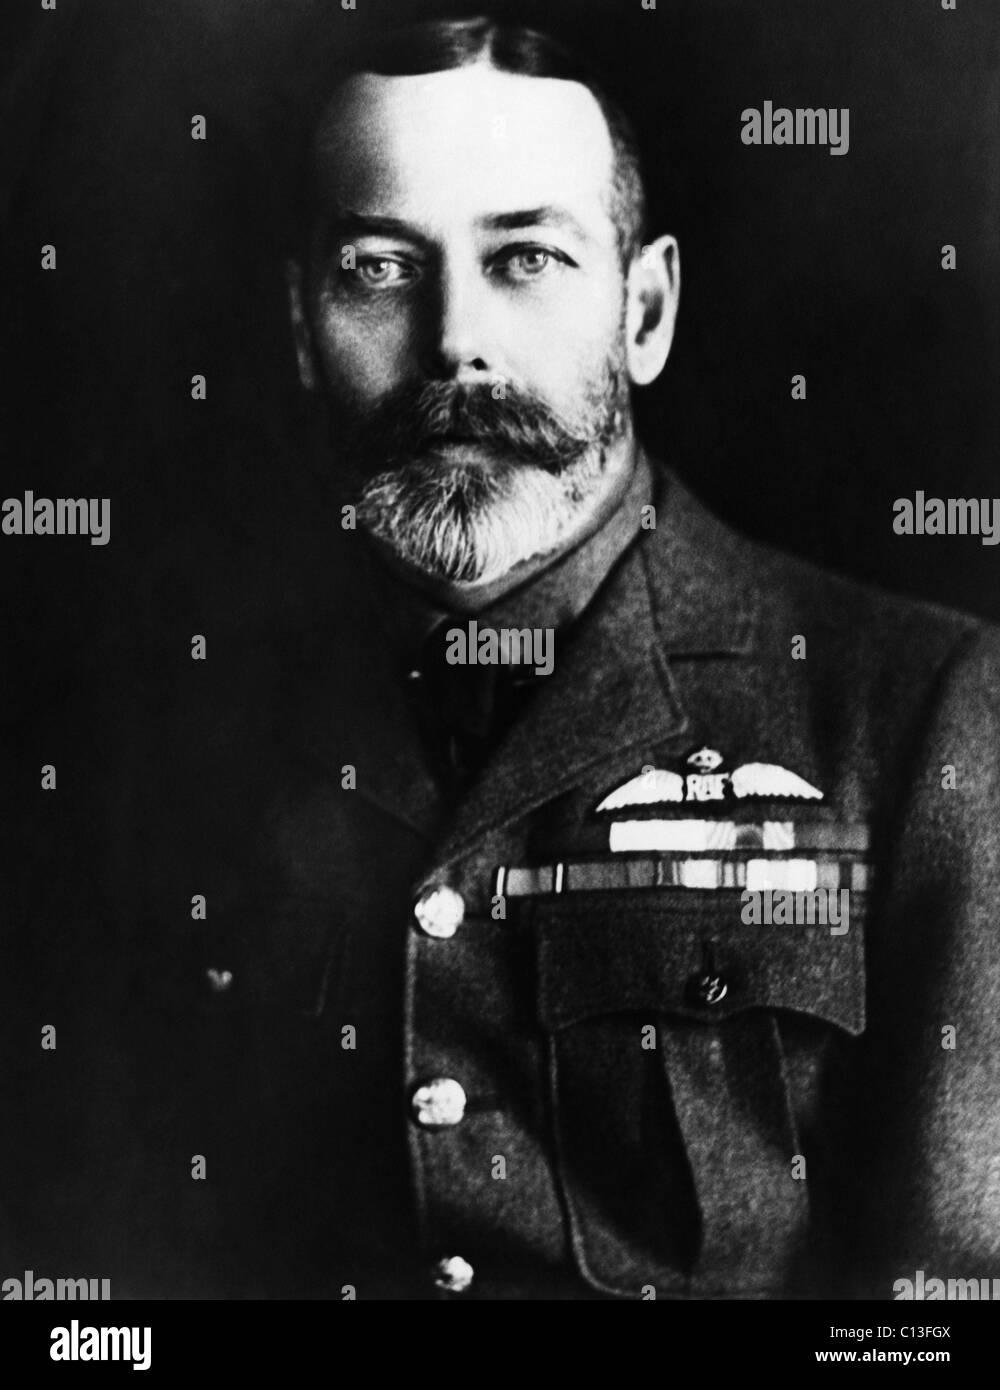 British Royalty. King George V of England, circa 1910s. - Stock Image